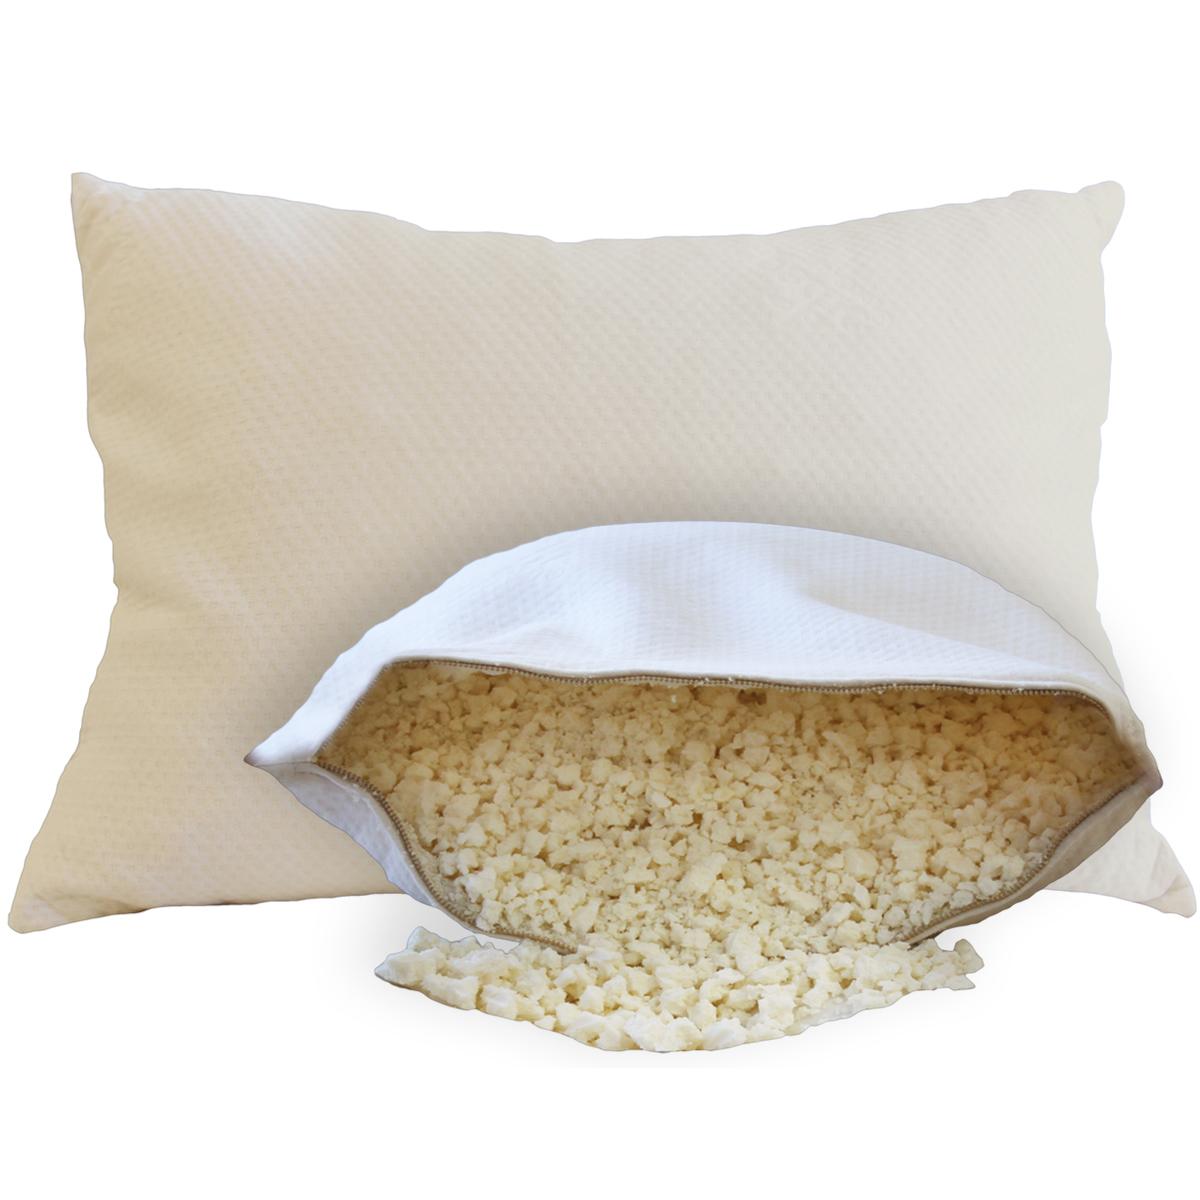 The Crush Natural Shredded Rubber Pillow